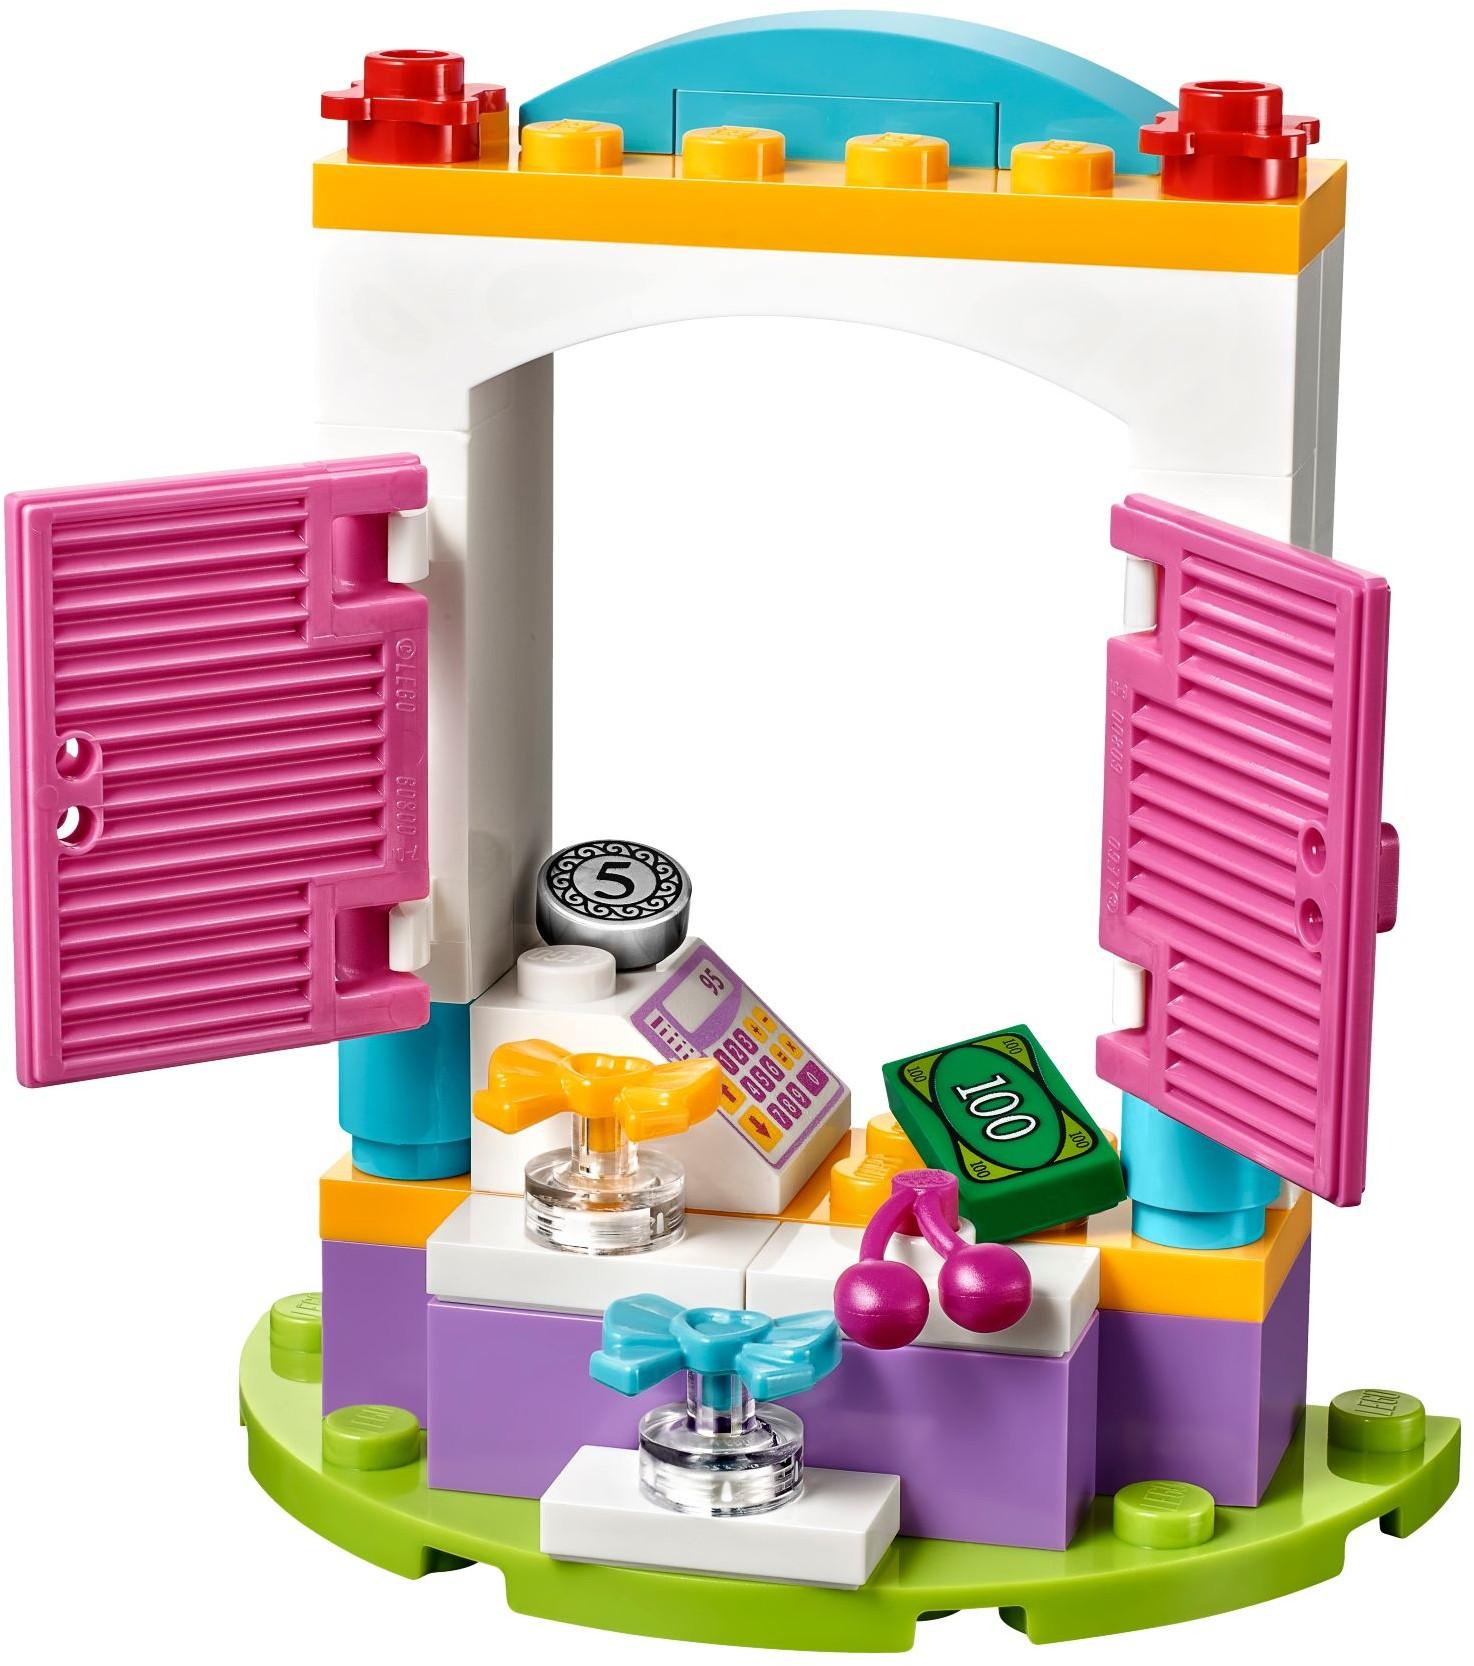 41113 LEGO® Friends Party Gift Shop - Bữa tiệc quà tặng